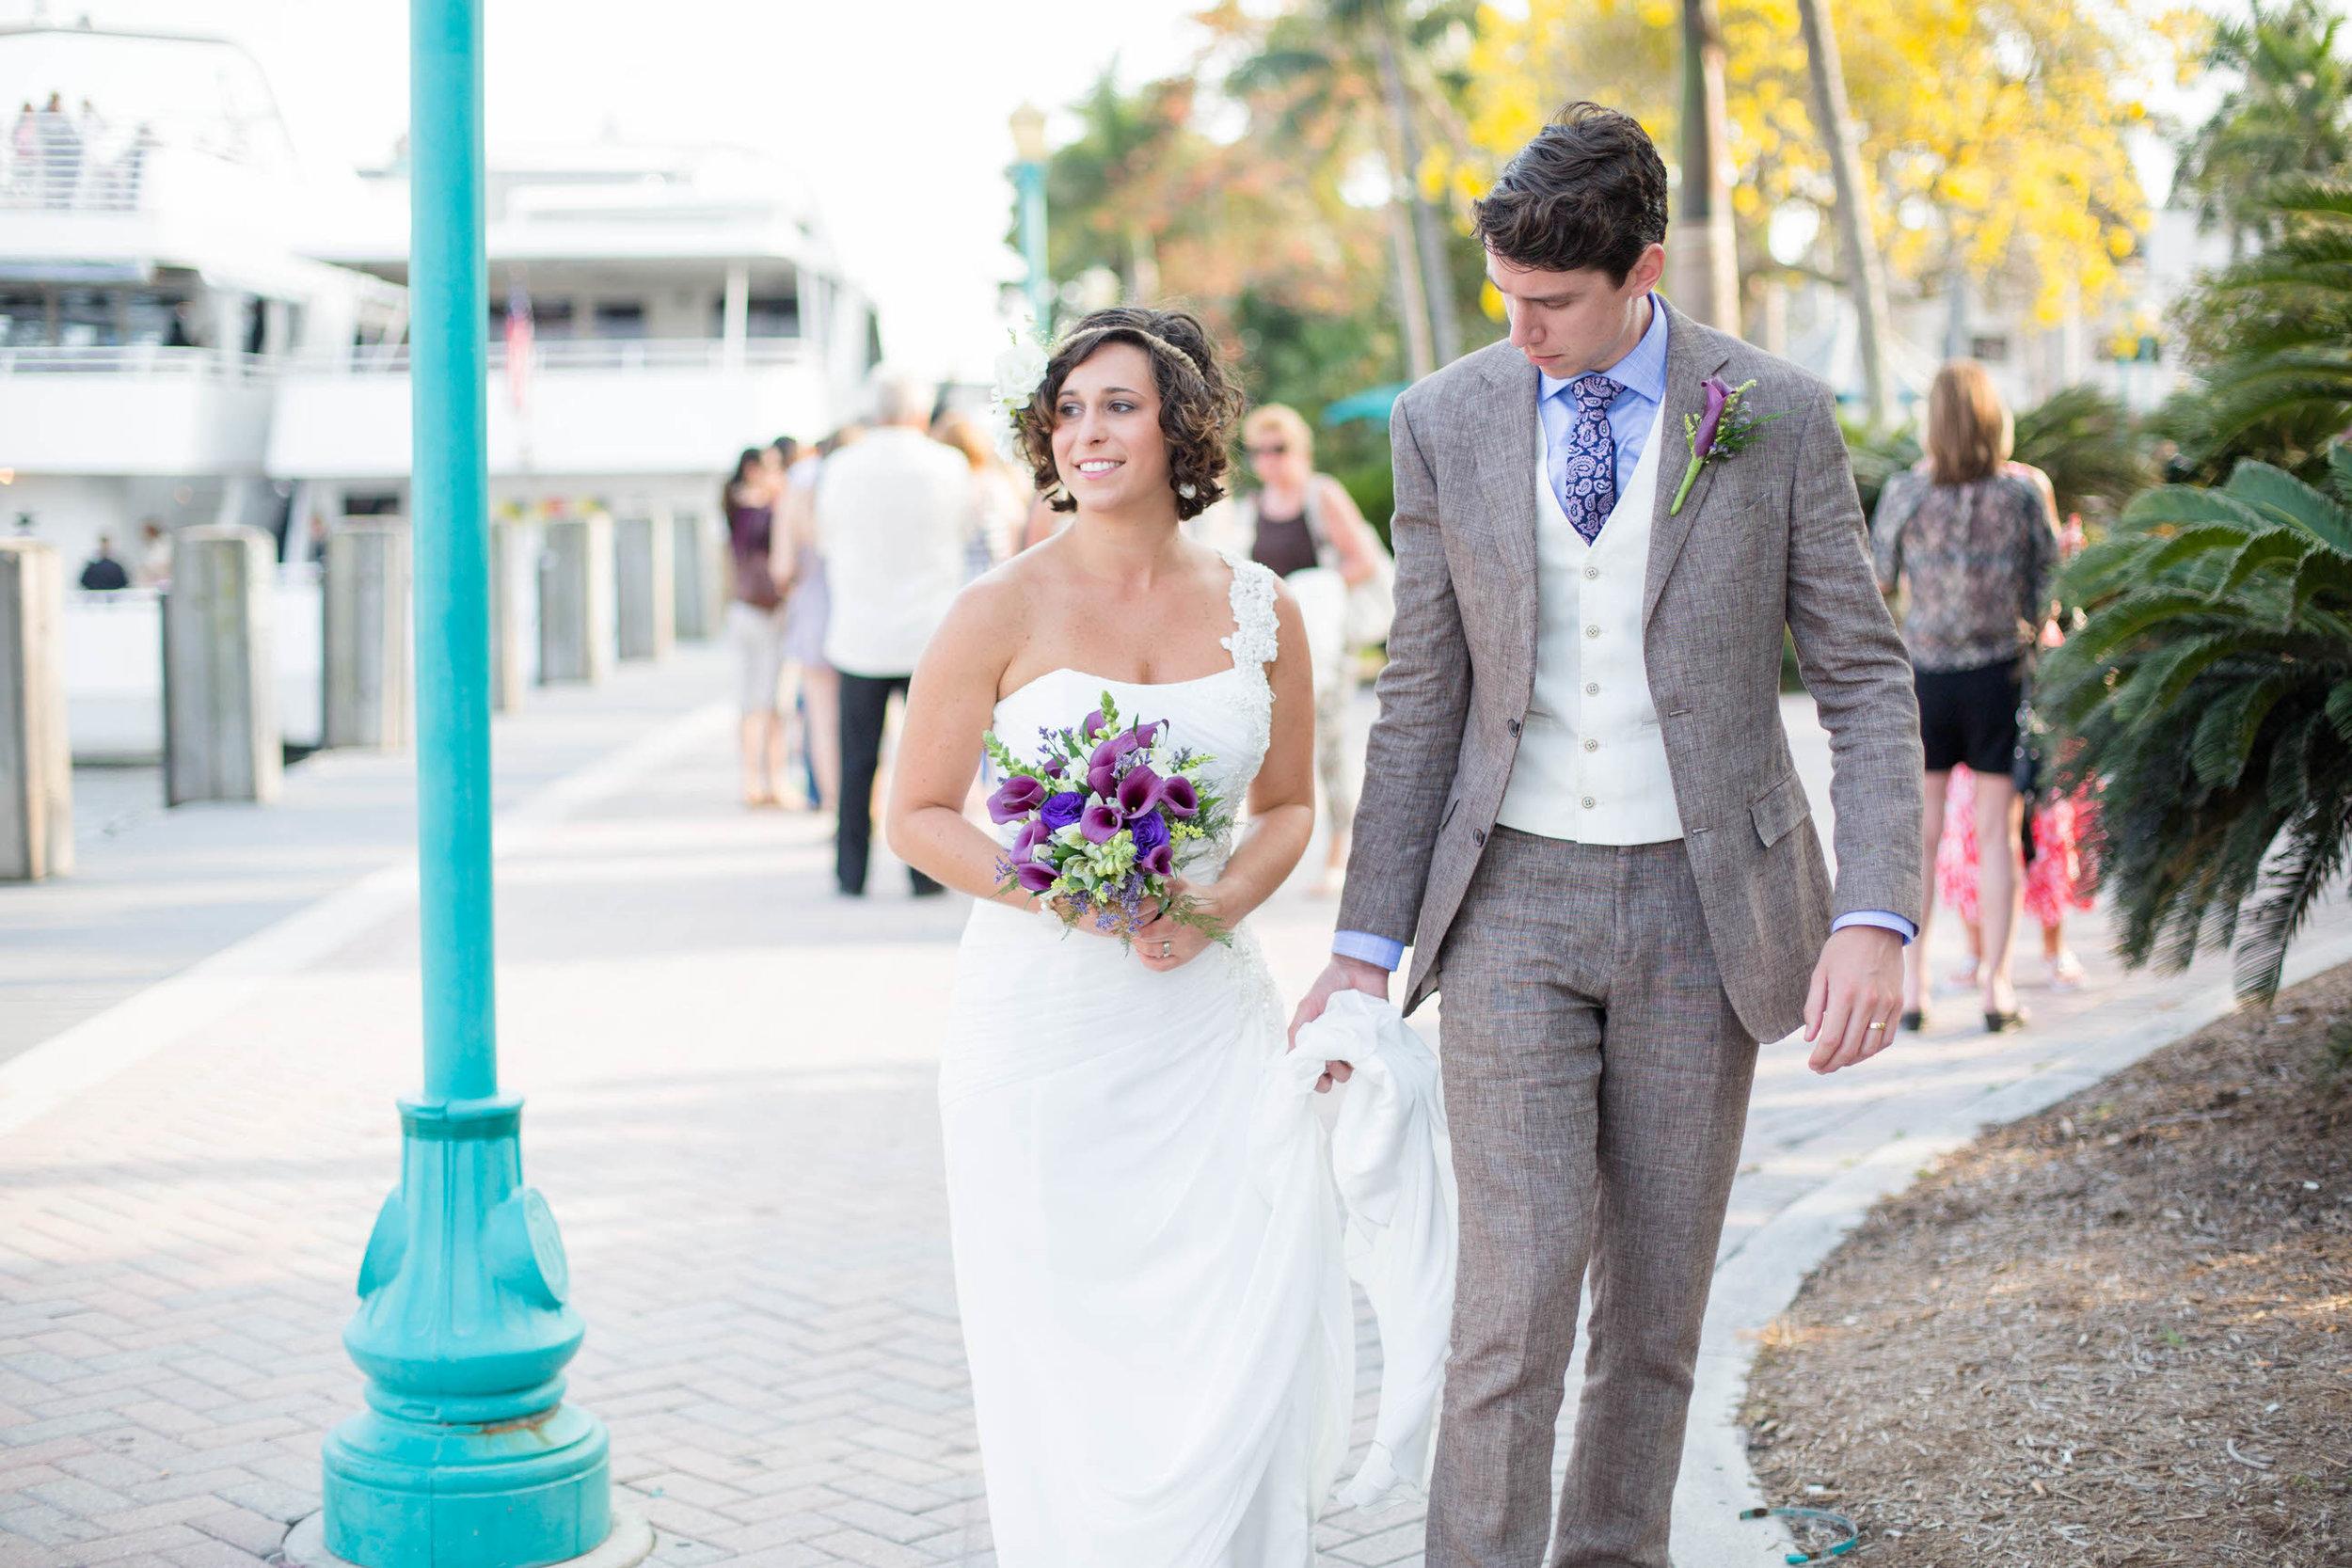 bride-groom-walking-lady-delray-boat-wedding-tiny-house-photo.jpg